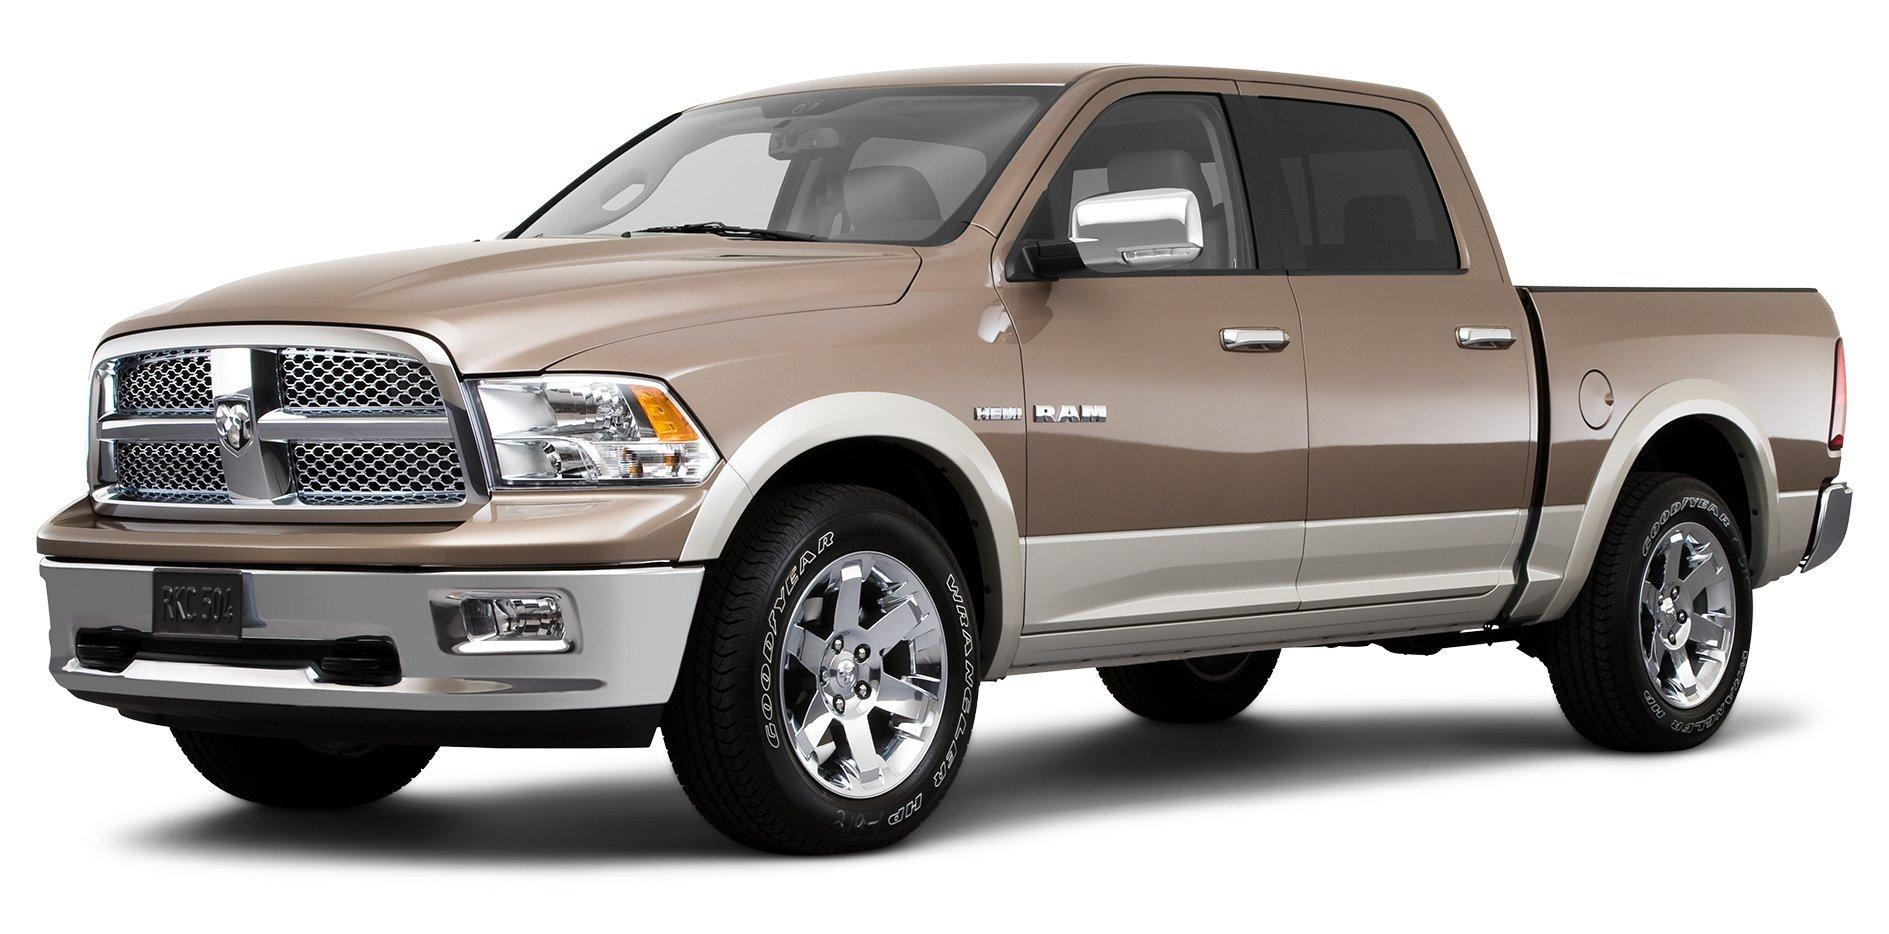 2010 Dodge Ram 1500 Reviews Images And Specs Vehicles 1961 Pickup Truck Laramie 2 Wheel Drive Crew Cab 1405